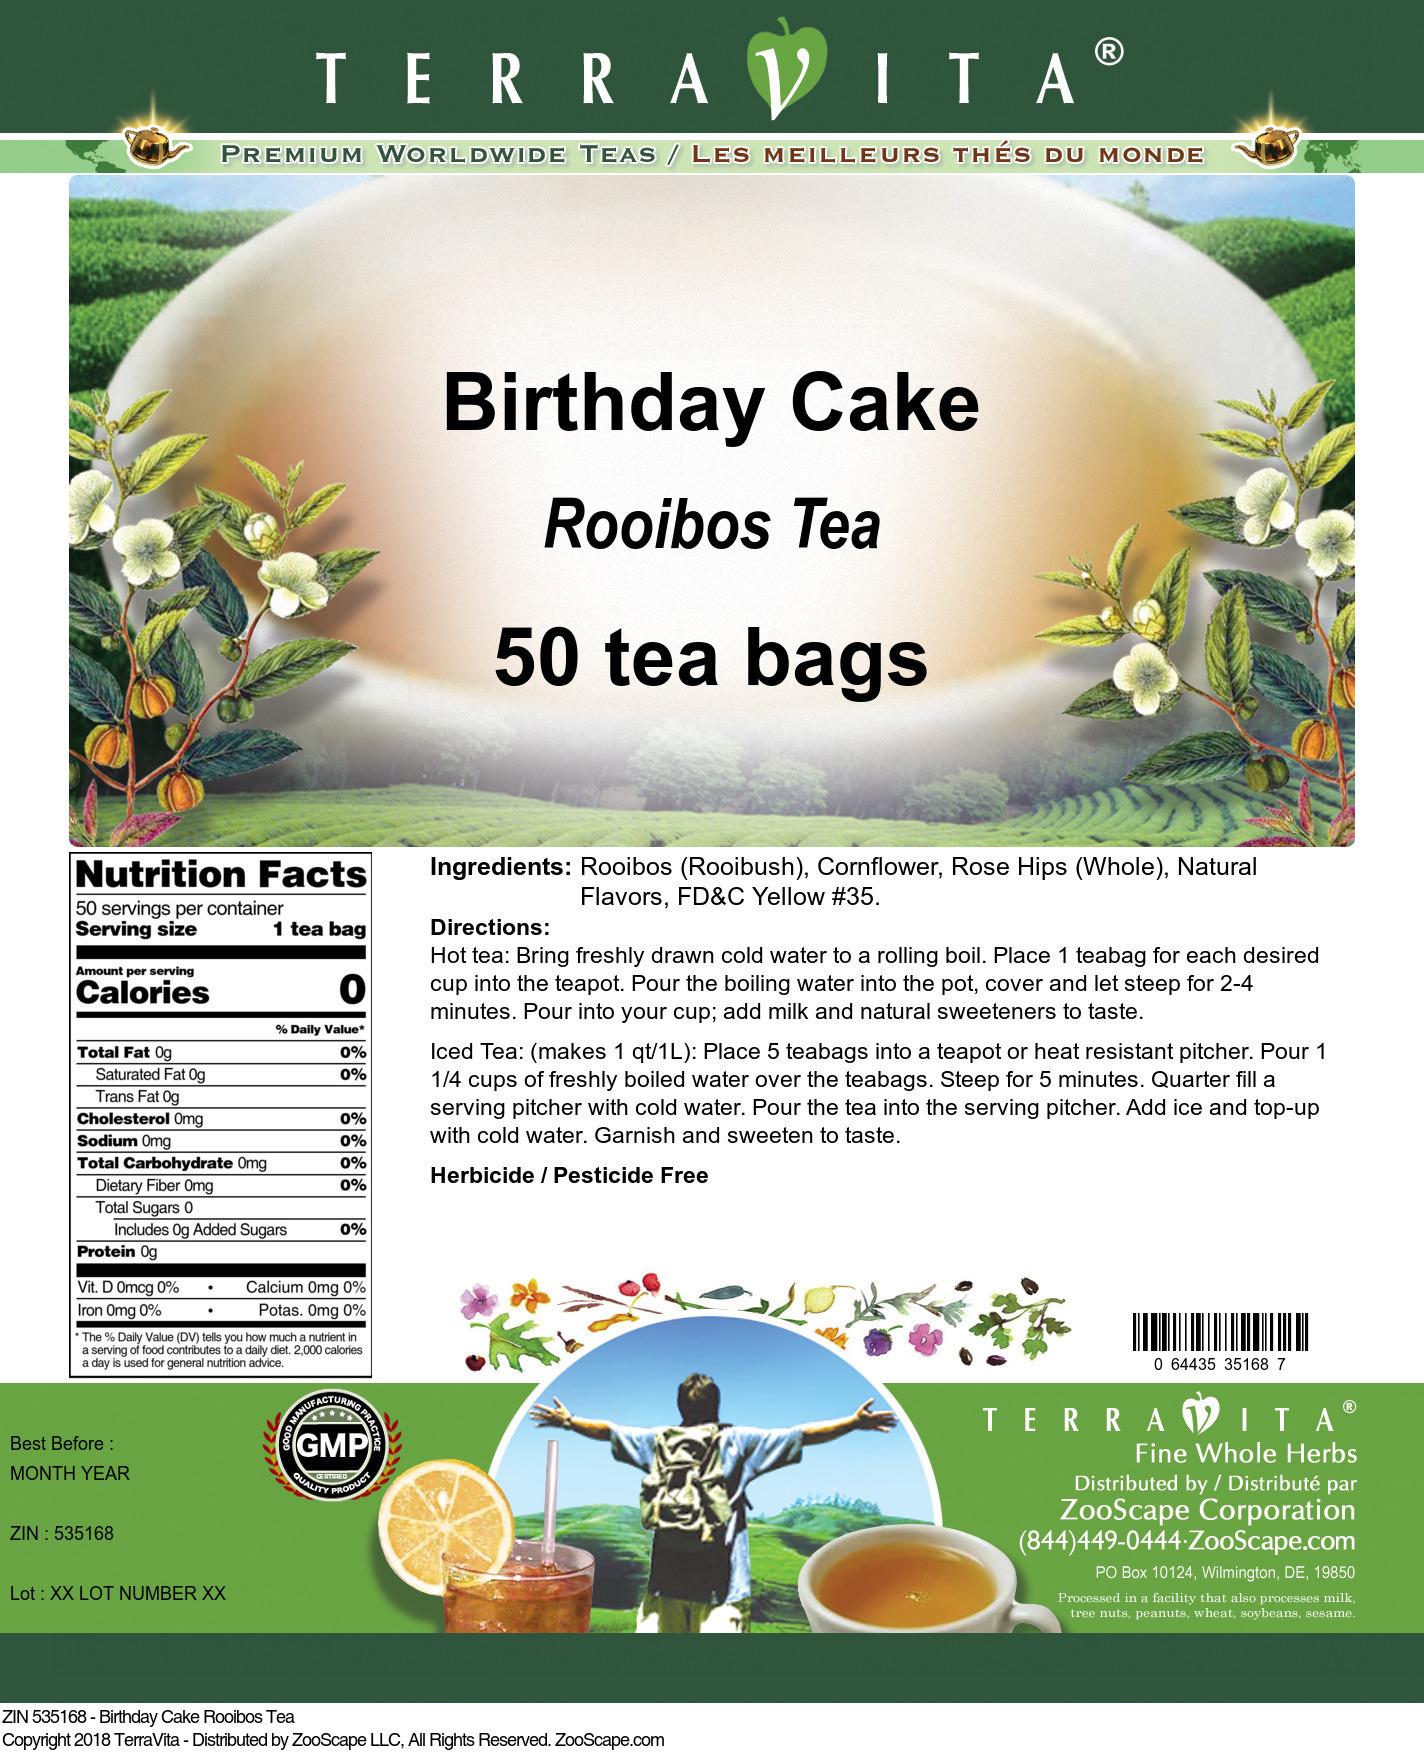 Birthday Cake Rooibos Tea